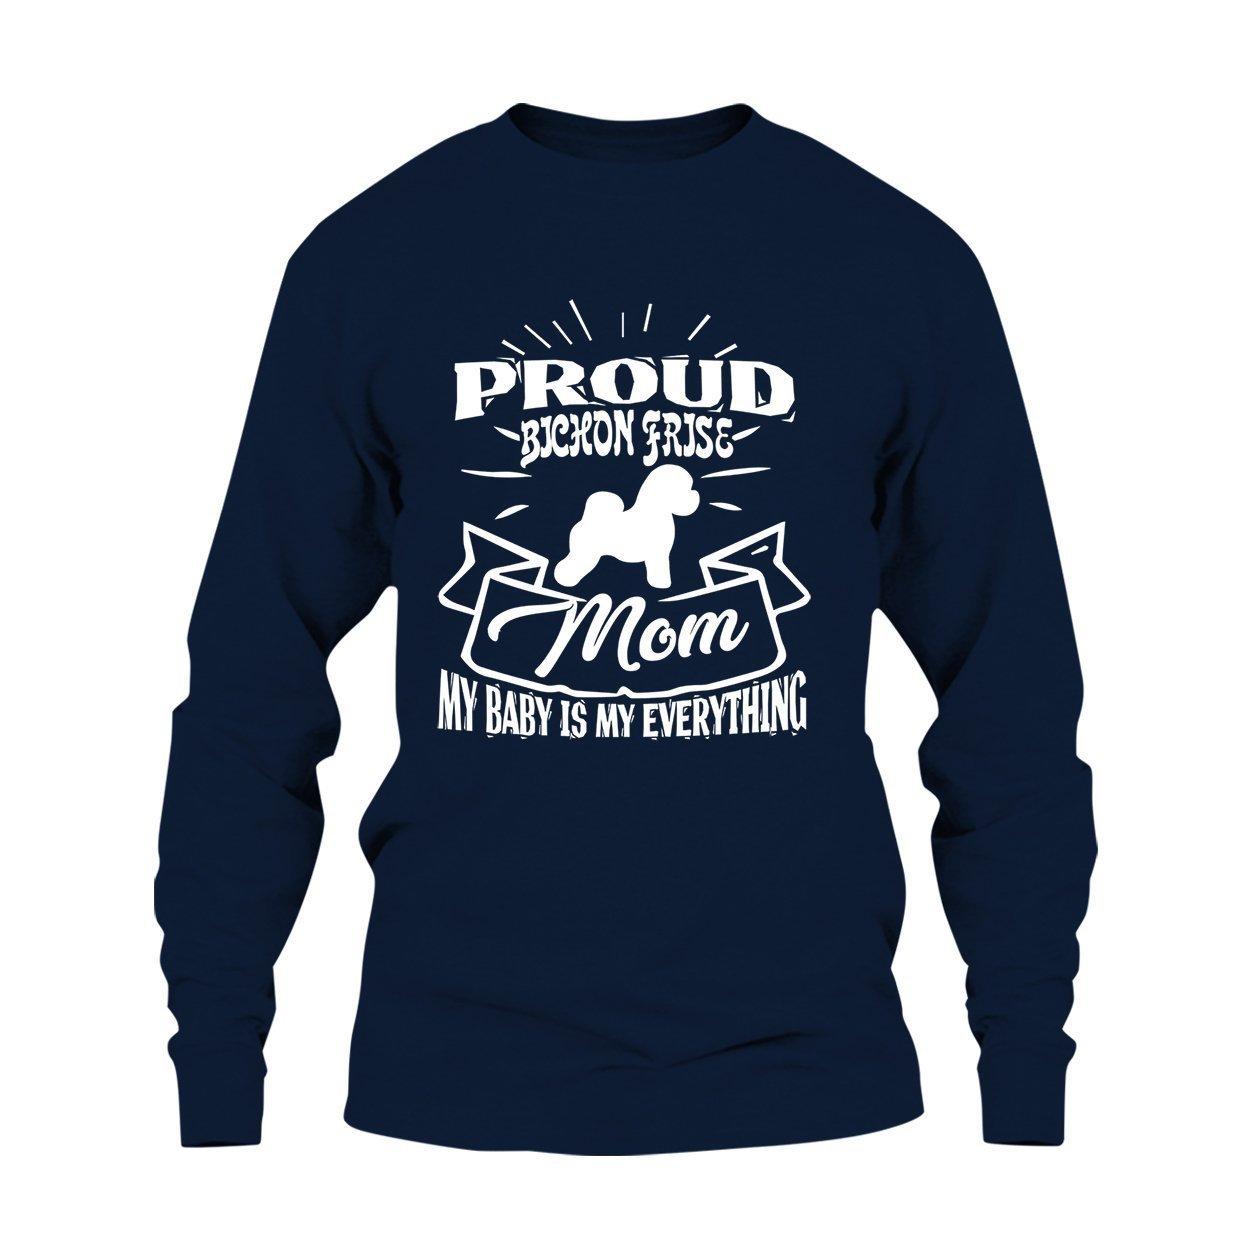 Proud Bichon Frise Mom Tee Shirt, Cool Sweatshirt, Hoodie Six Emu